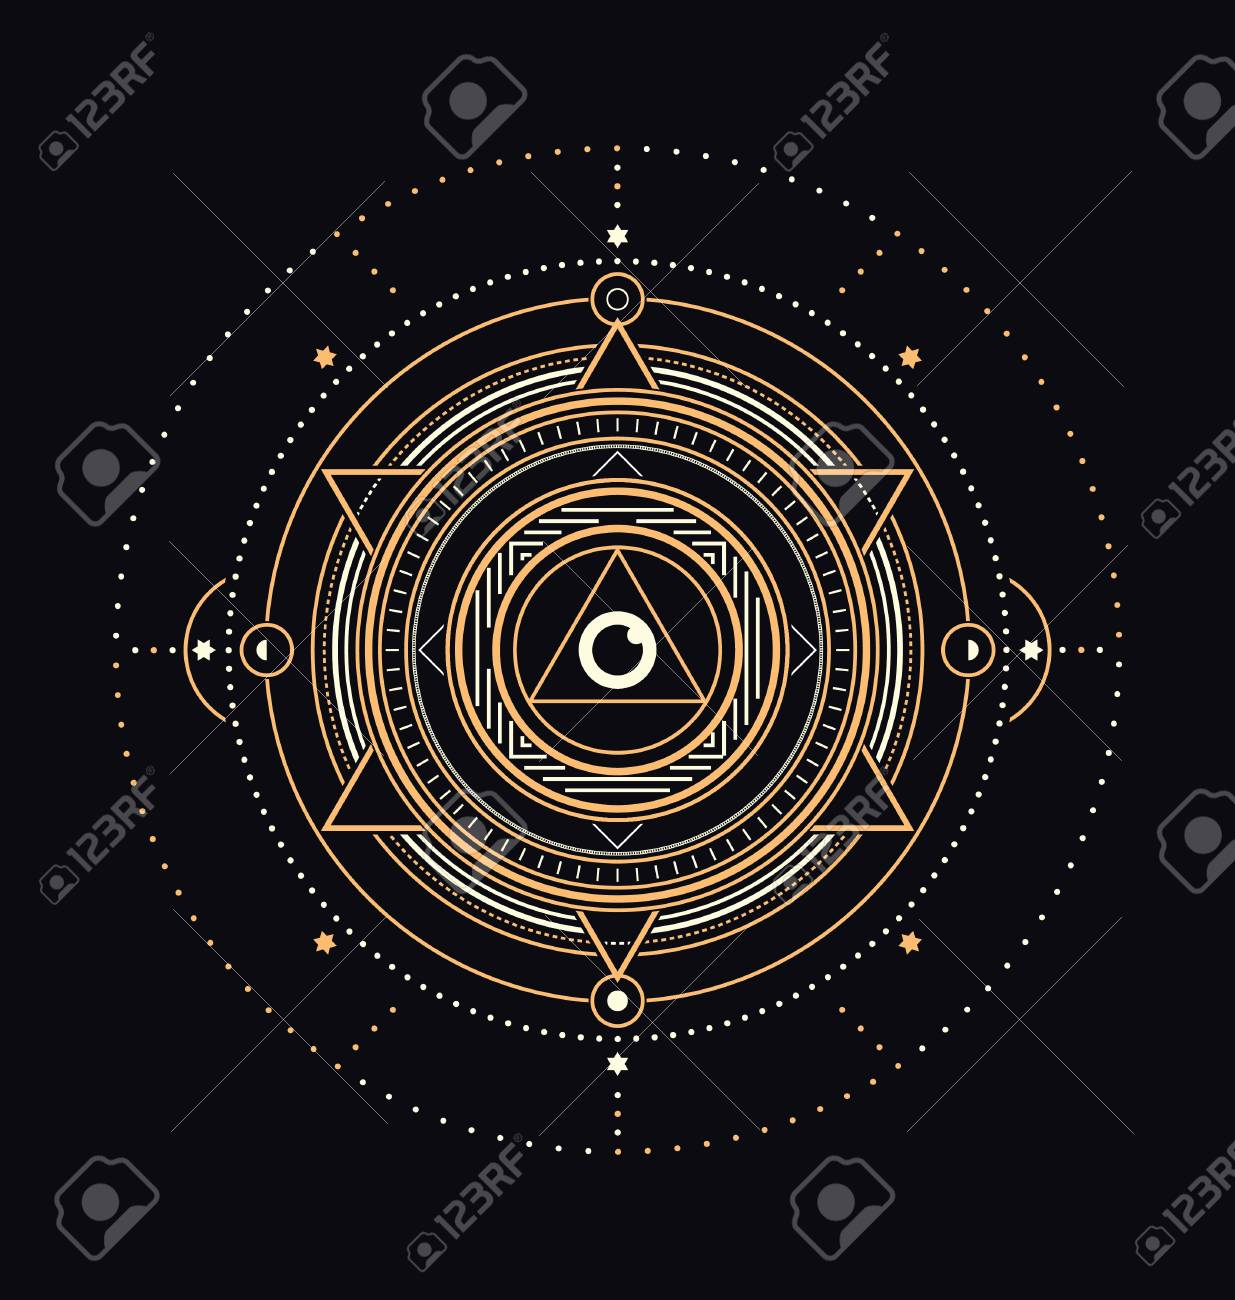 Sacred Symbols Design - Abstract Geometric Illustration - Gold and White Elements on Dark Background - 64270886